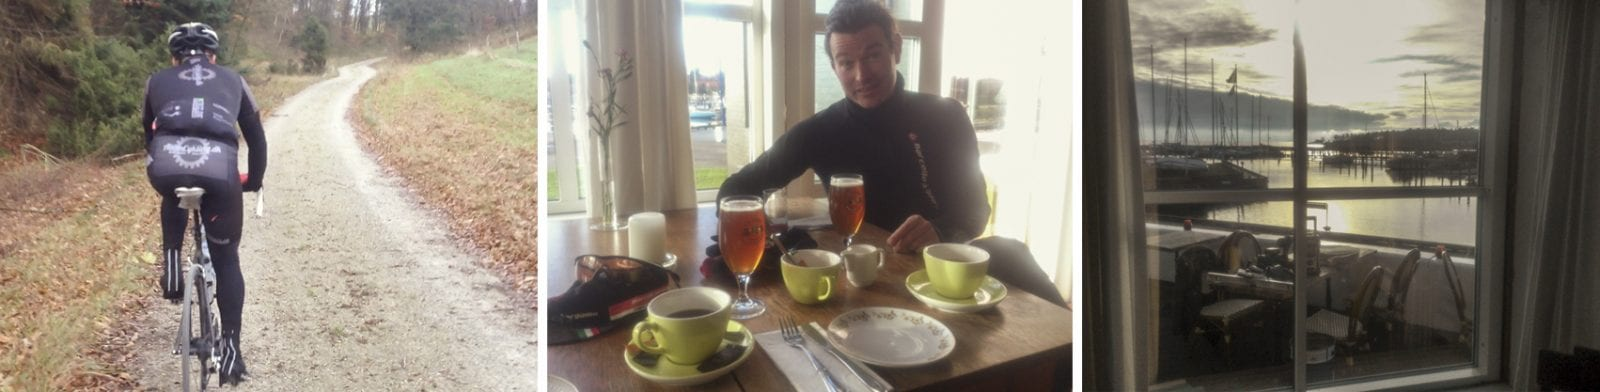 Først Agri,så kaffe og øl © AltomCykling.dk 2014